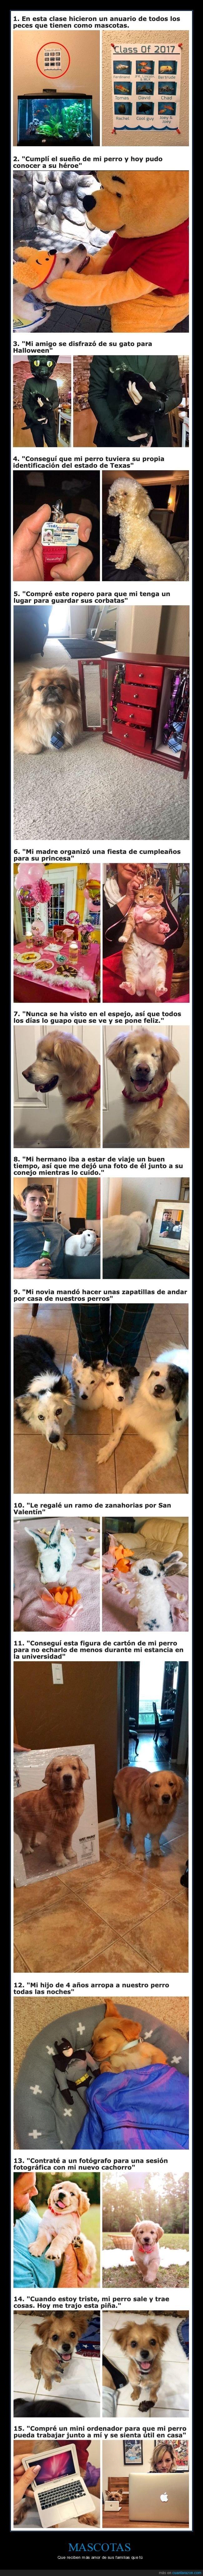 animales,mascotas,mimados